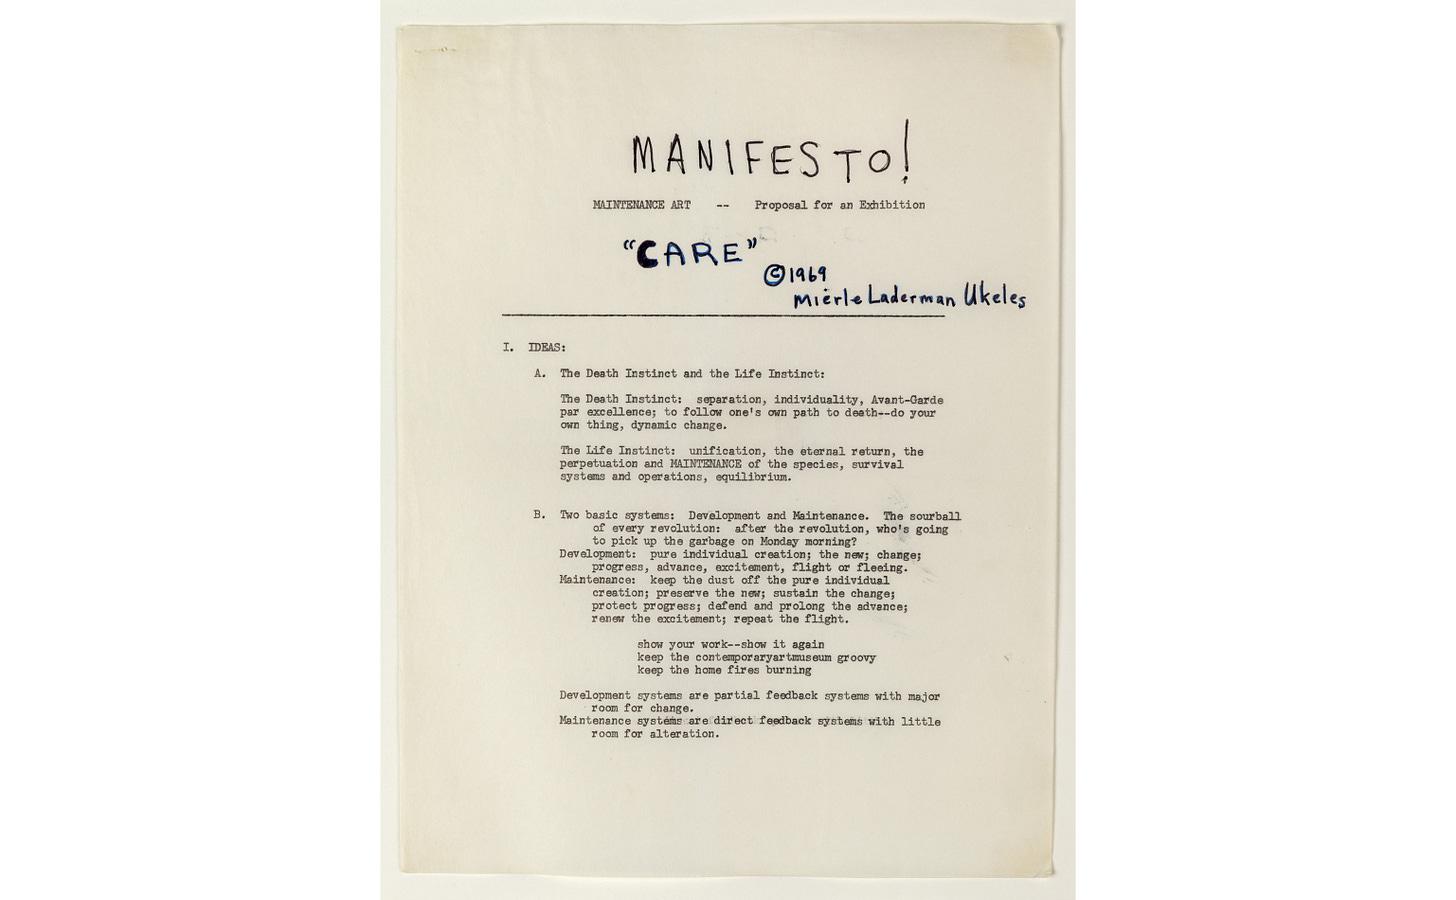 MANIFESTO FOR MAINTENANCE ART, 1969!